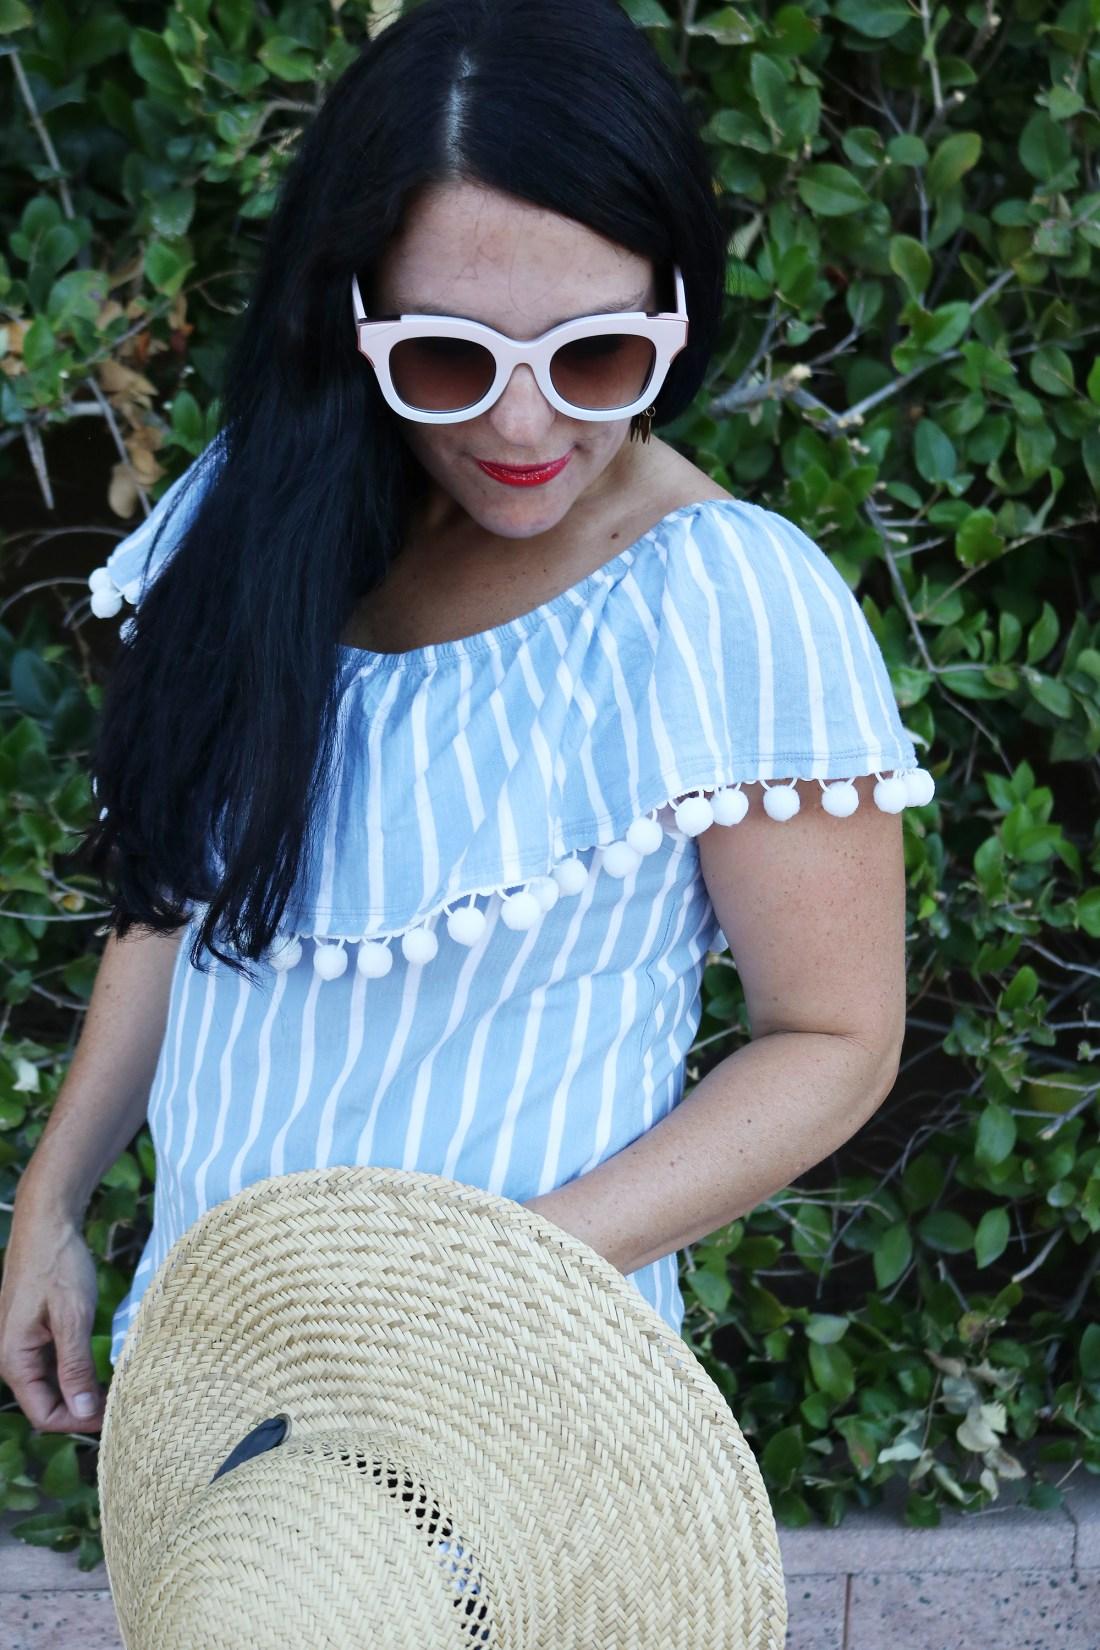 DIY Pom Pom Shirt for 4th of July || Darling Darleen #darlingdarleen #diy #pompomshirt #darleenmeier